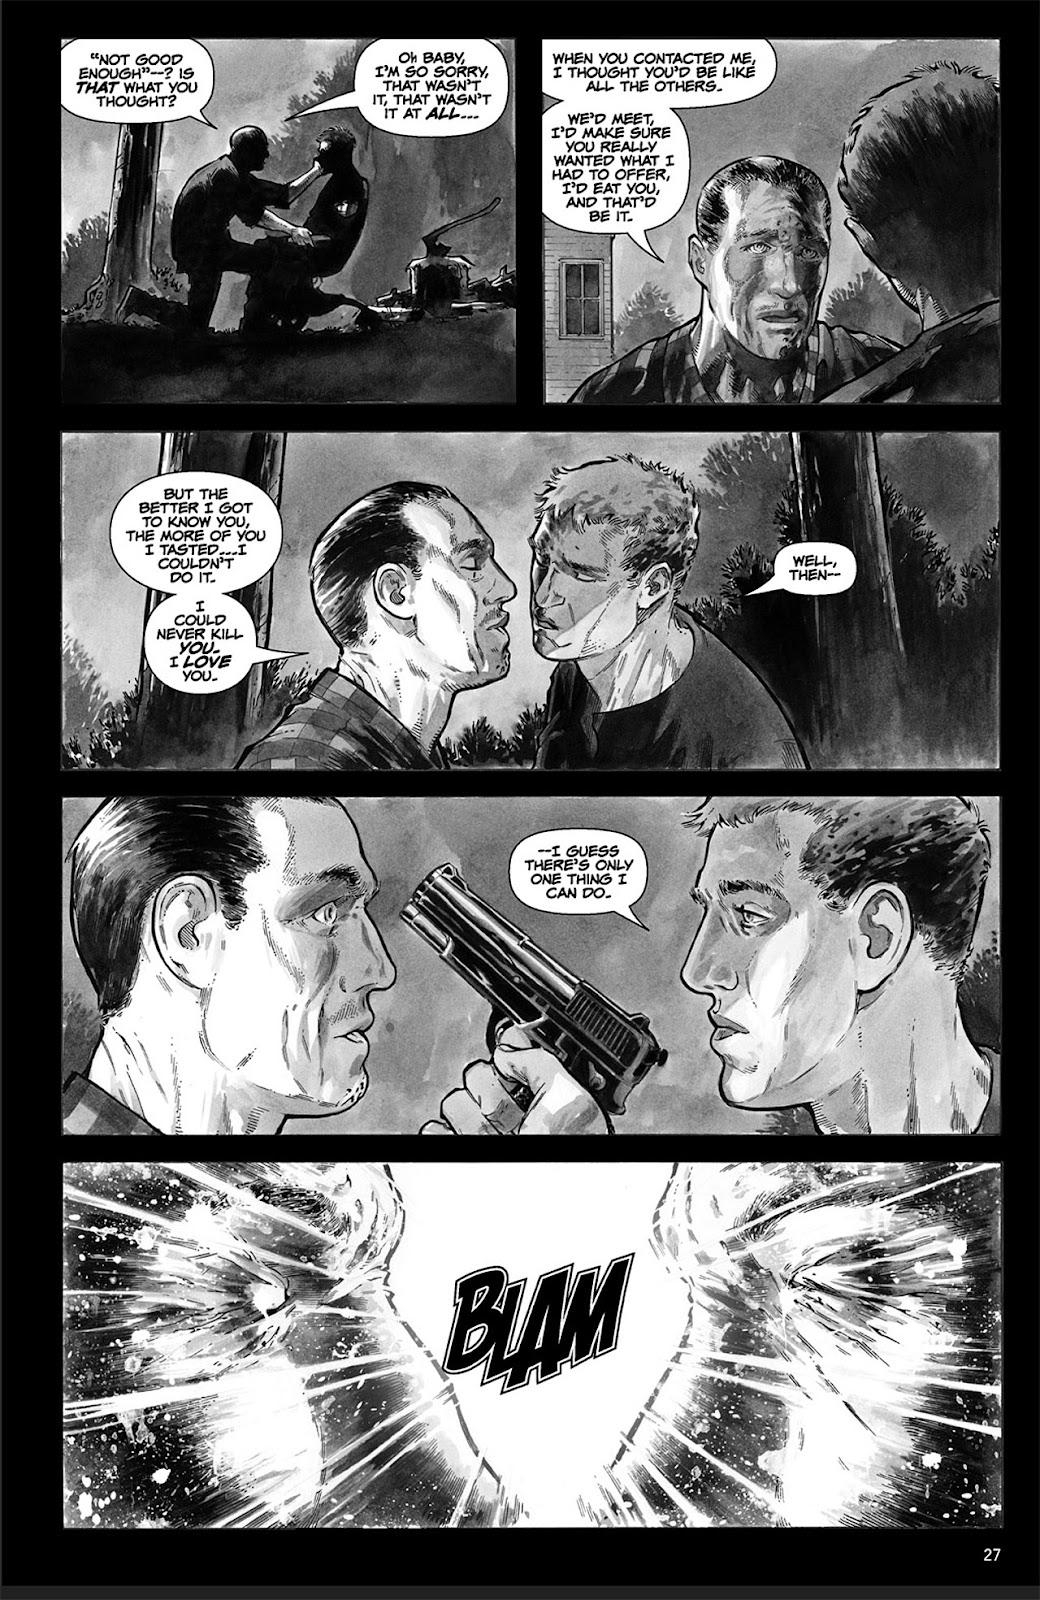 Creepy (2009) Issue #4 #4 - English 29